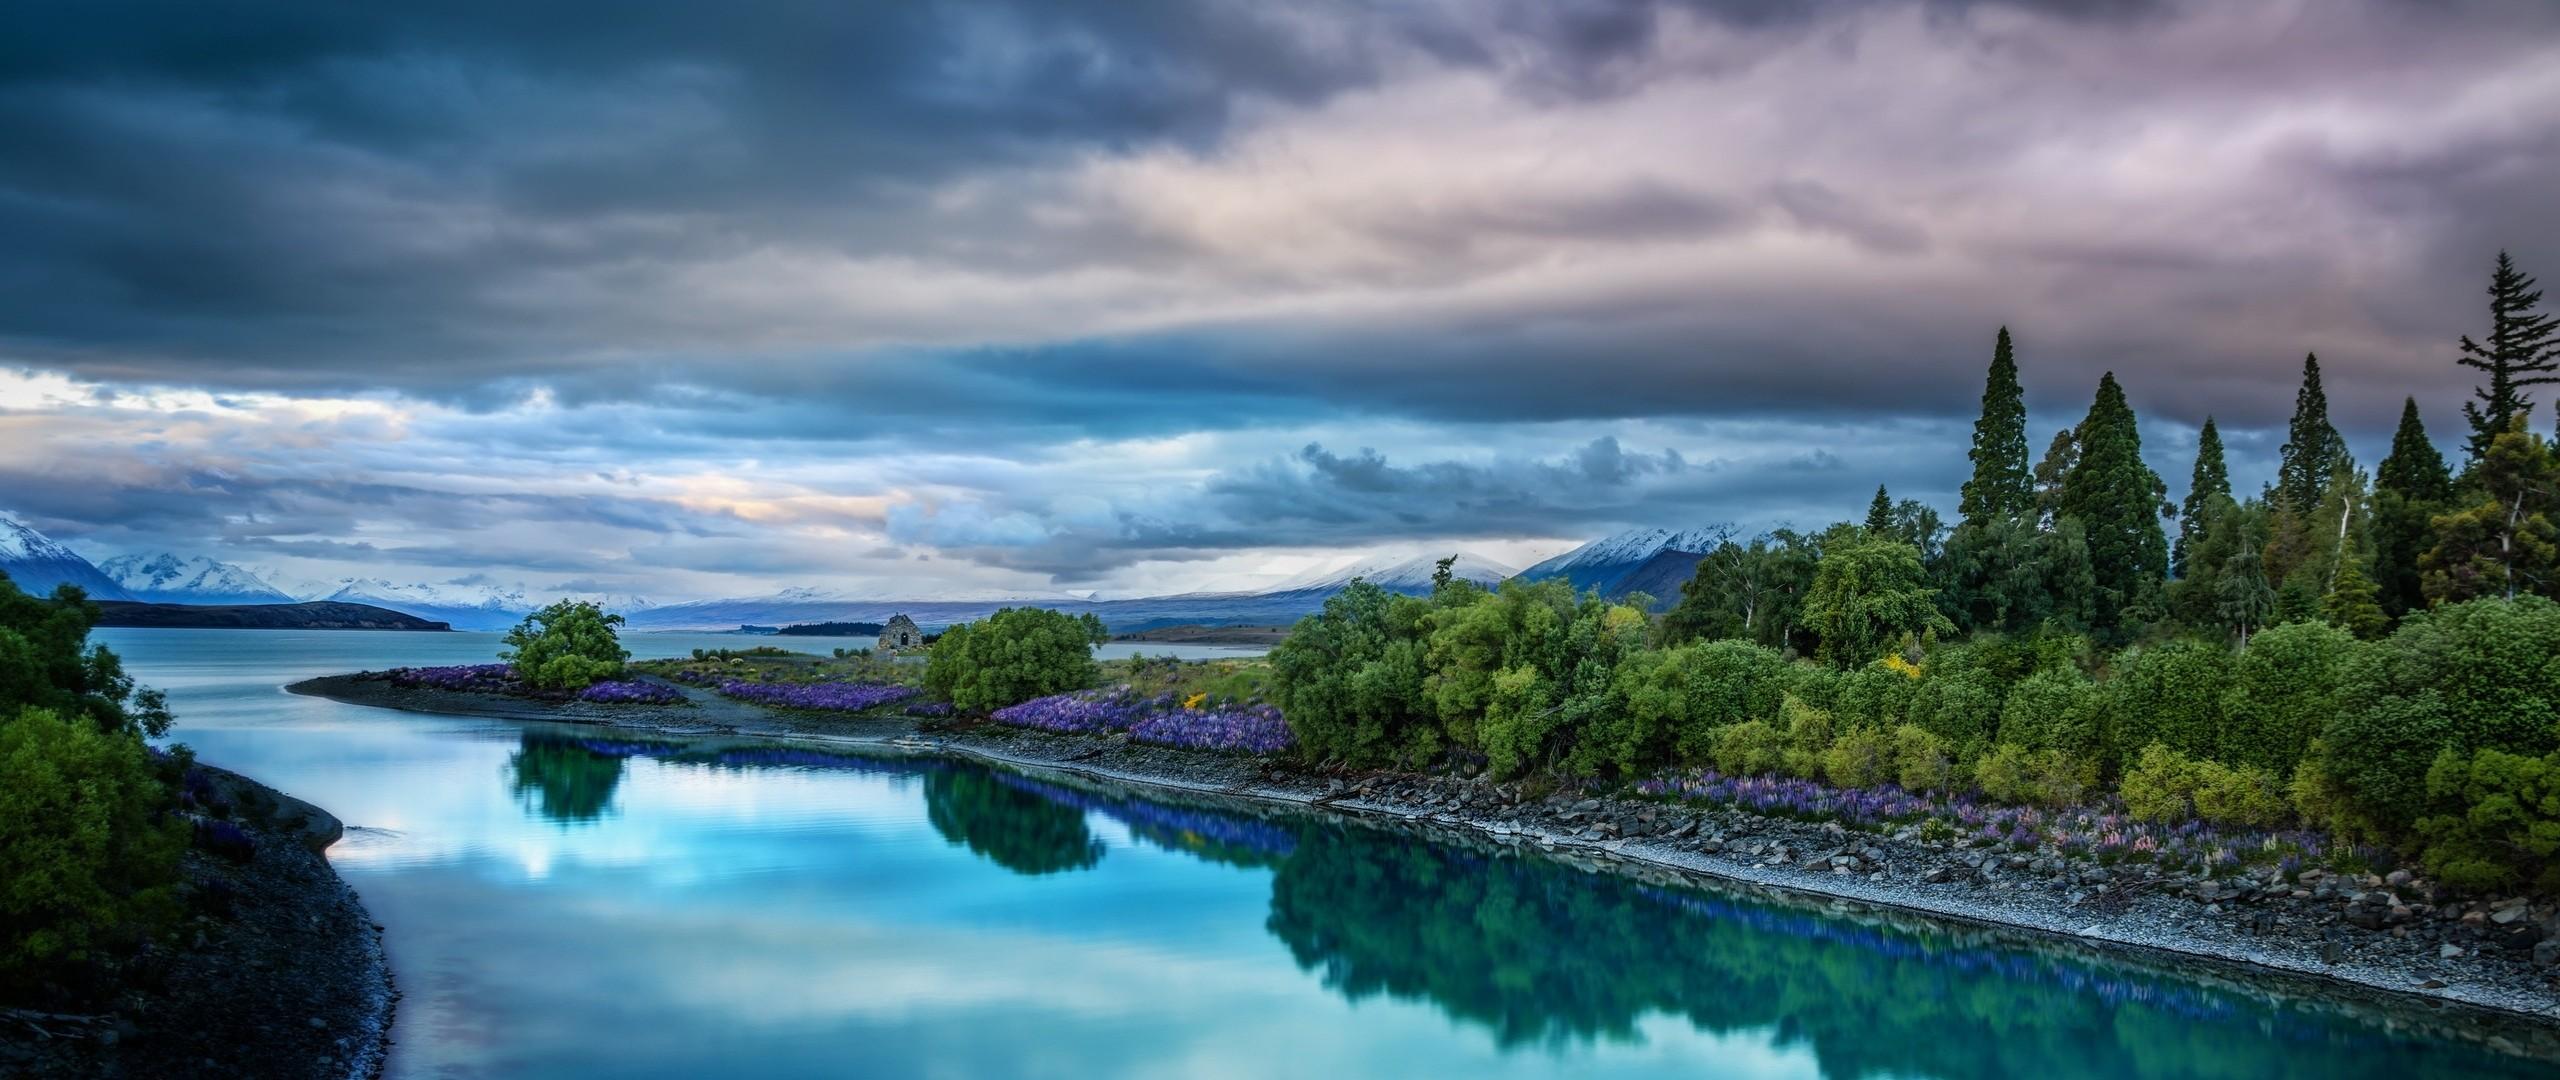 Wallpaper sky, nature, river, landscape